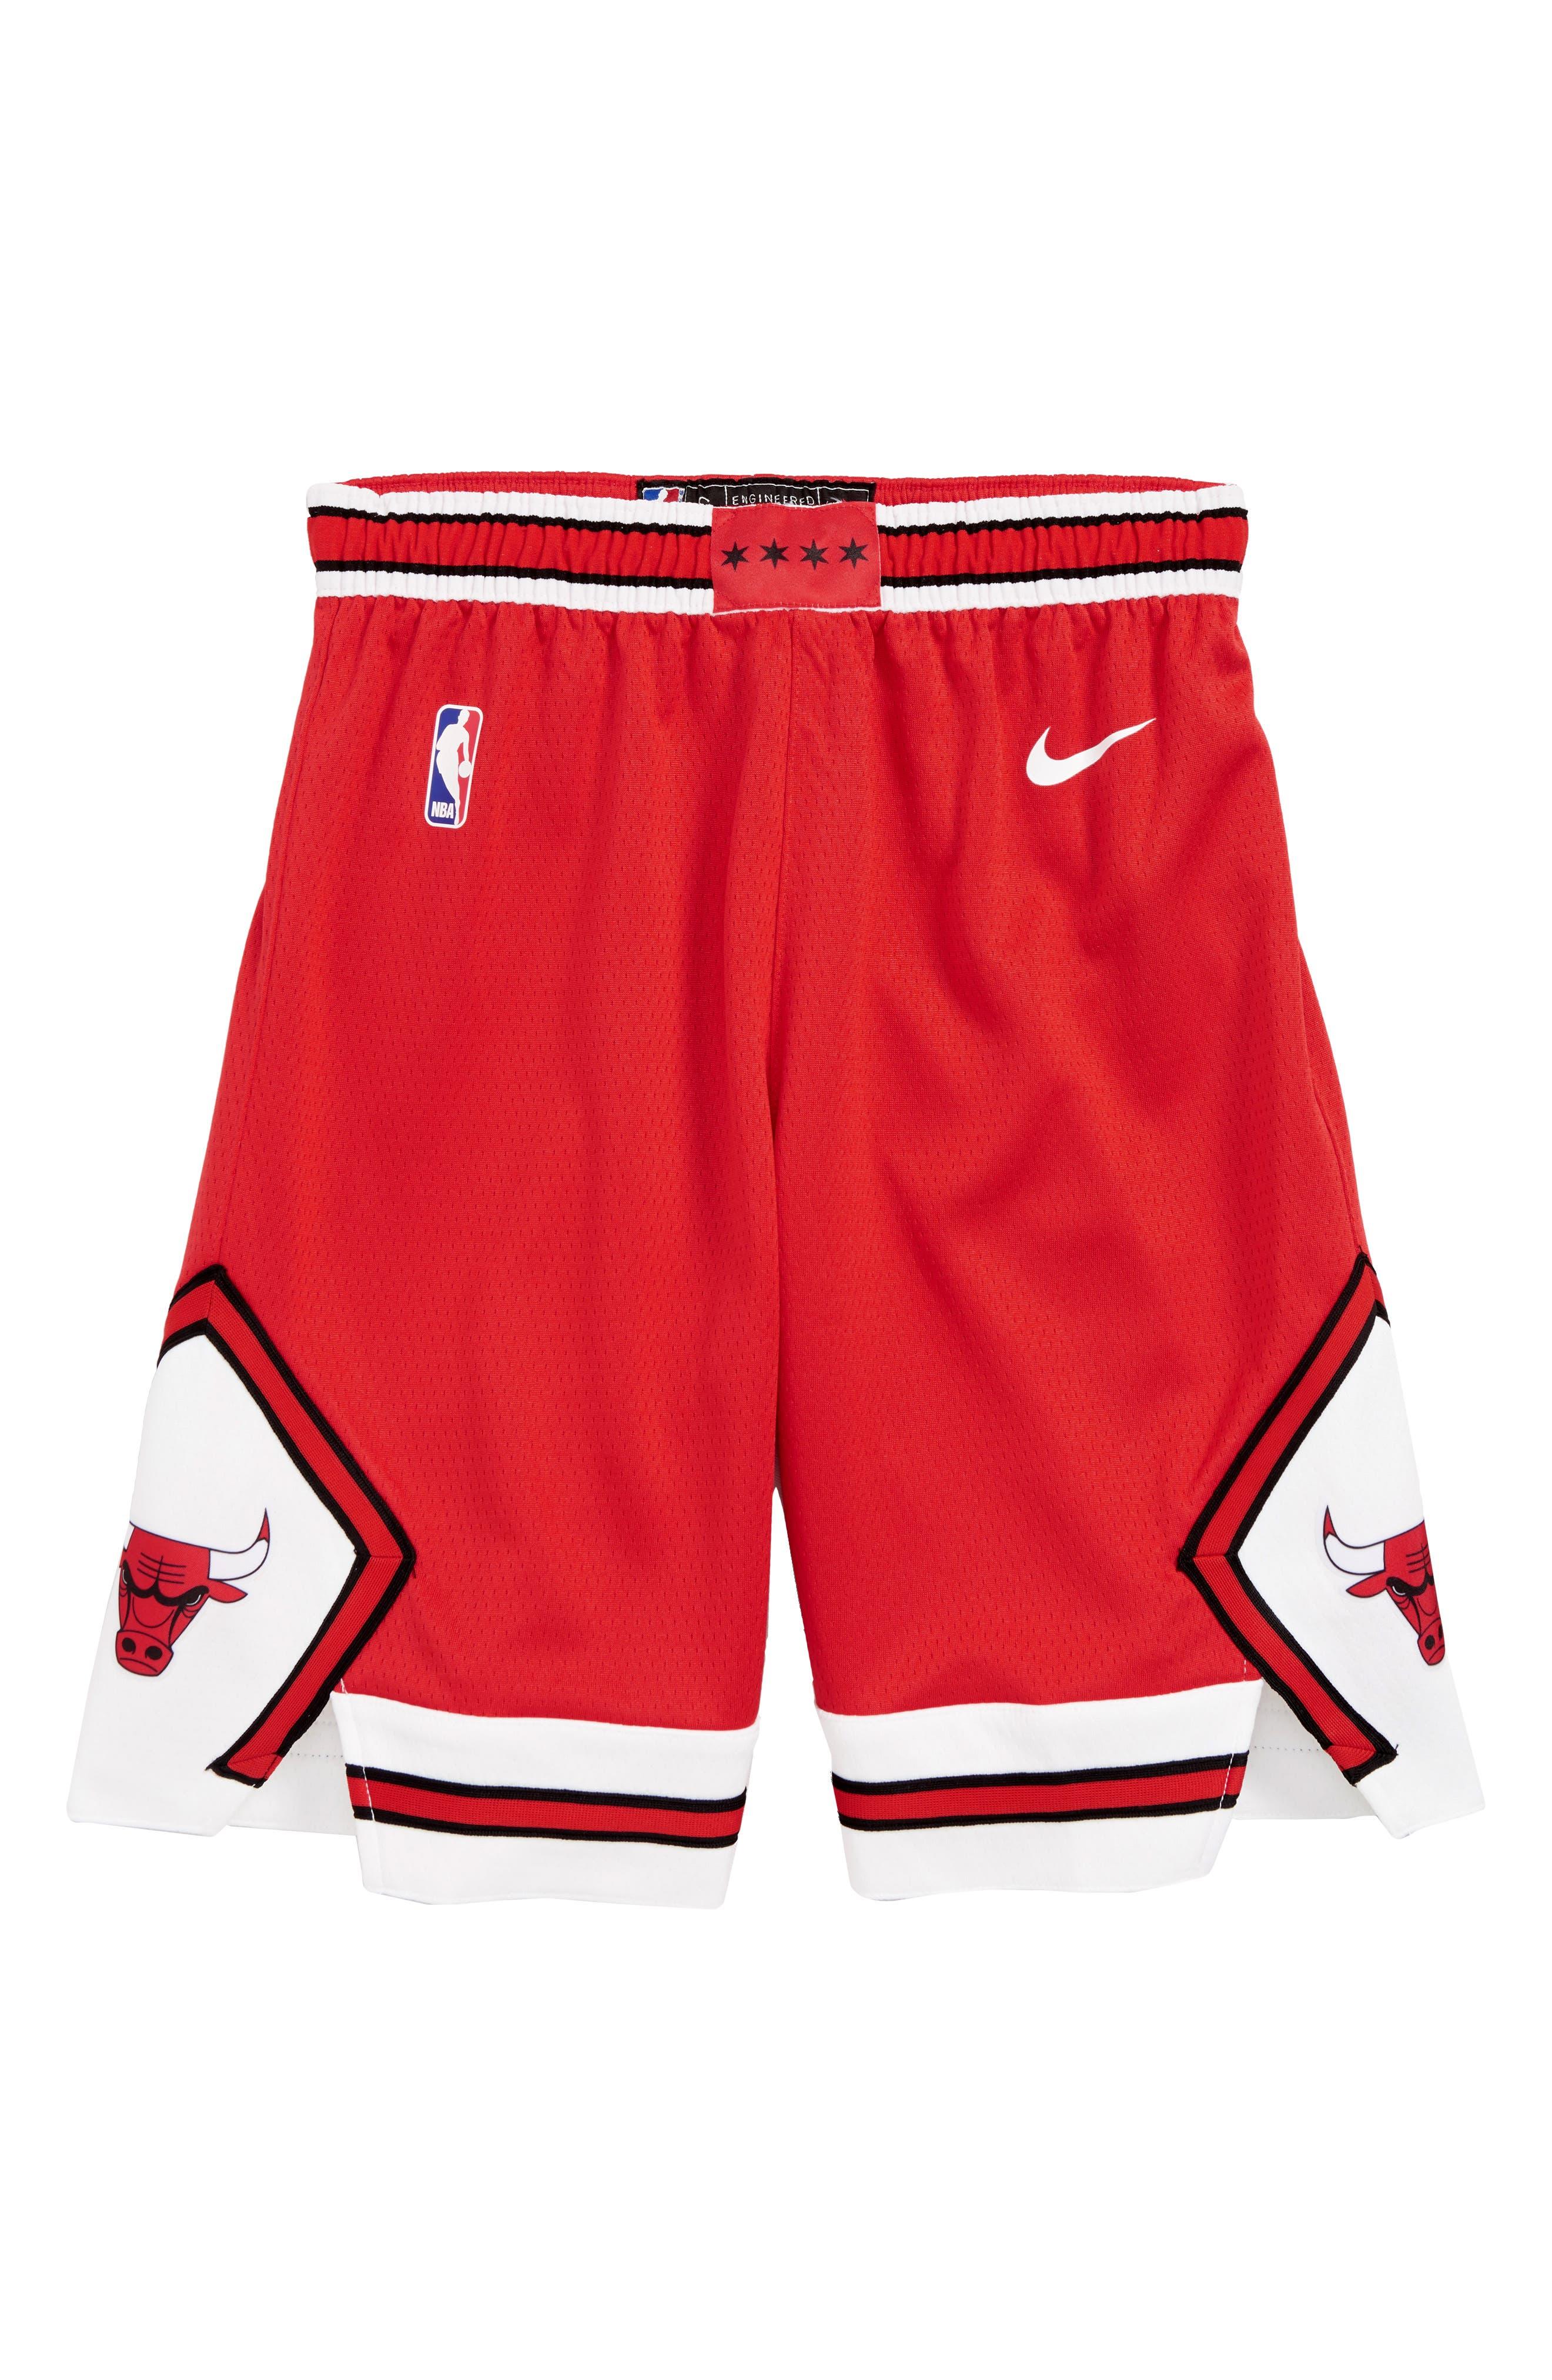 NIKE,                             Icon Chicago Bulls Basketball Shorts,                             Main thumbnail 1, color,                             UNIVERSITY RED